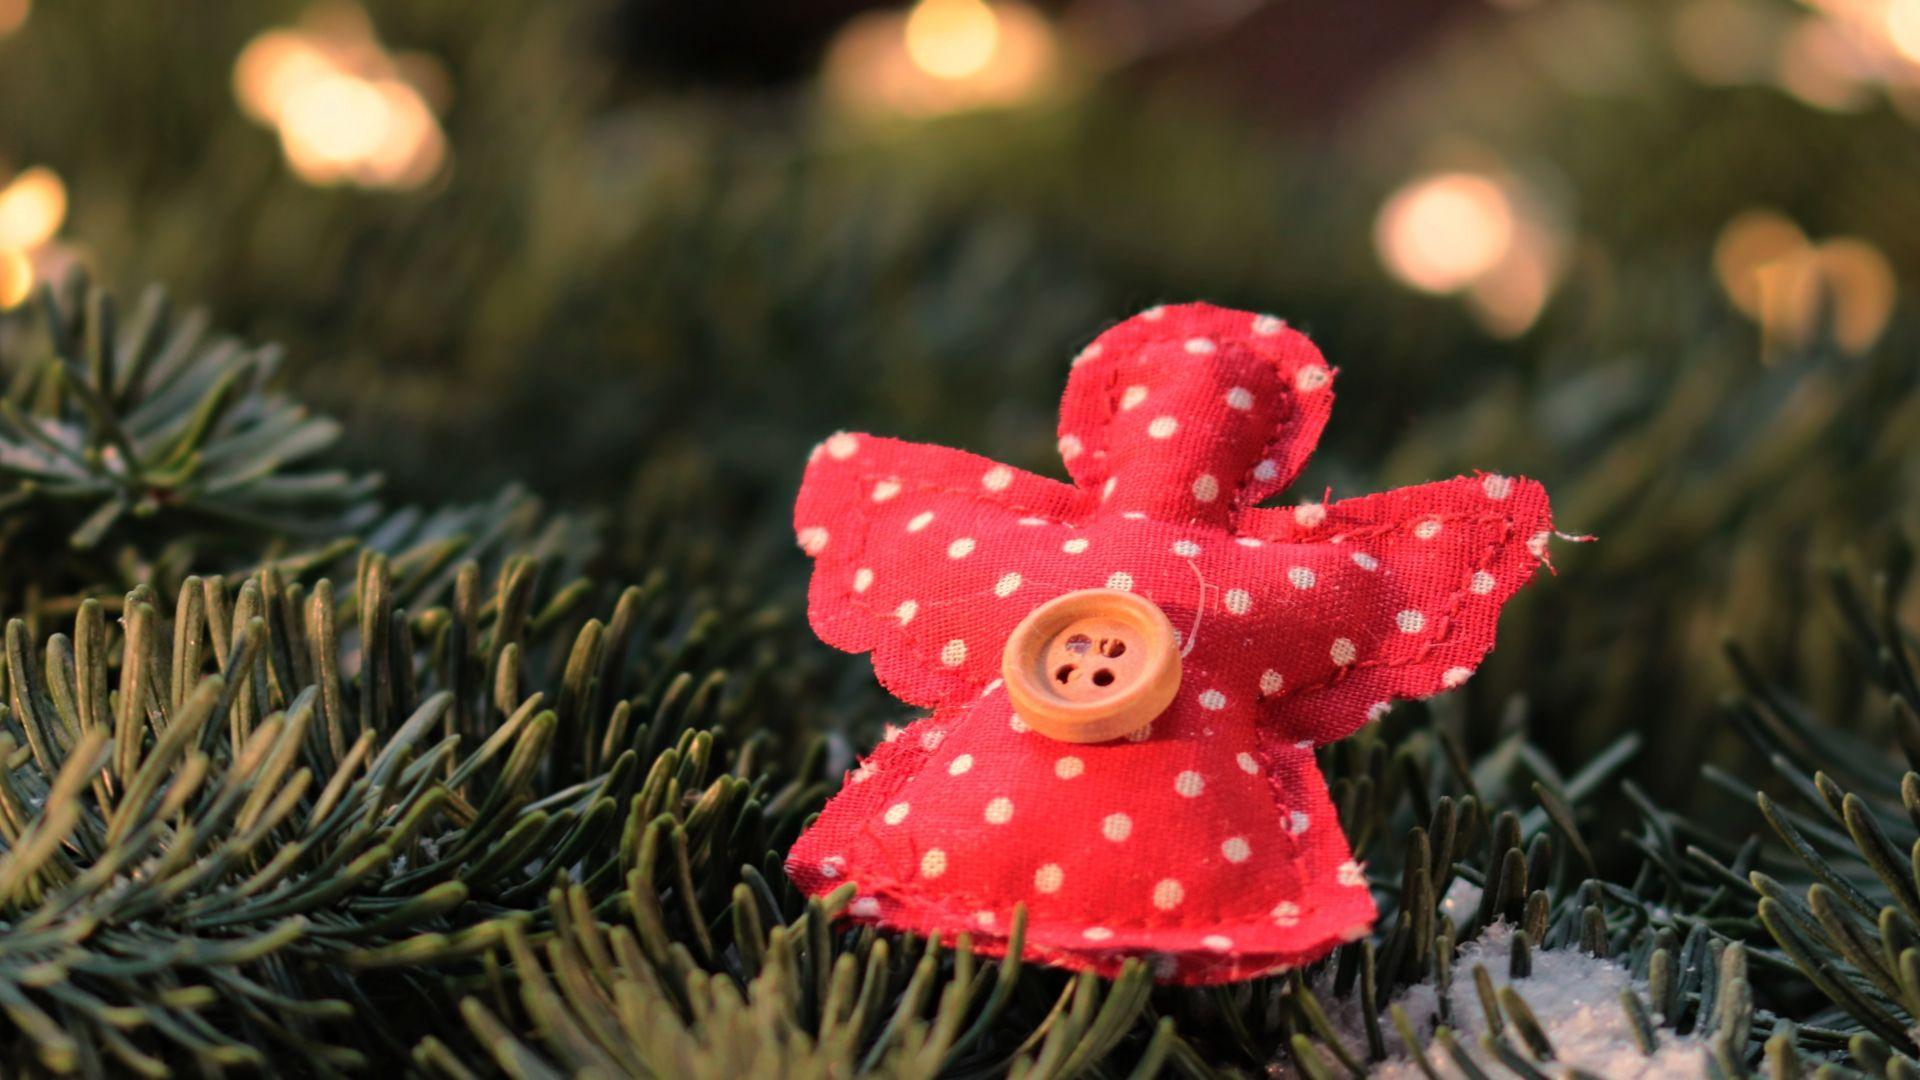 Wallpaper Christmas, angel, pine tree, branches, 2017, 5k